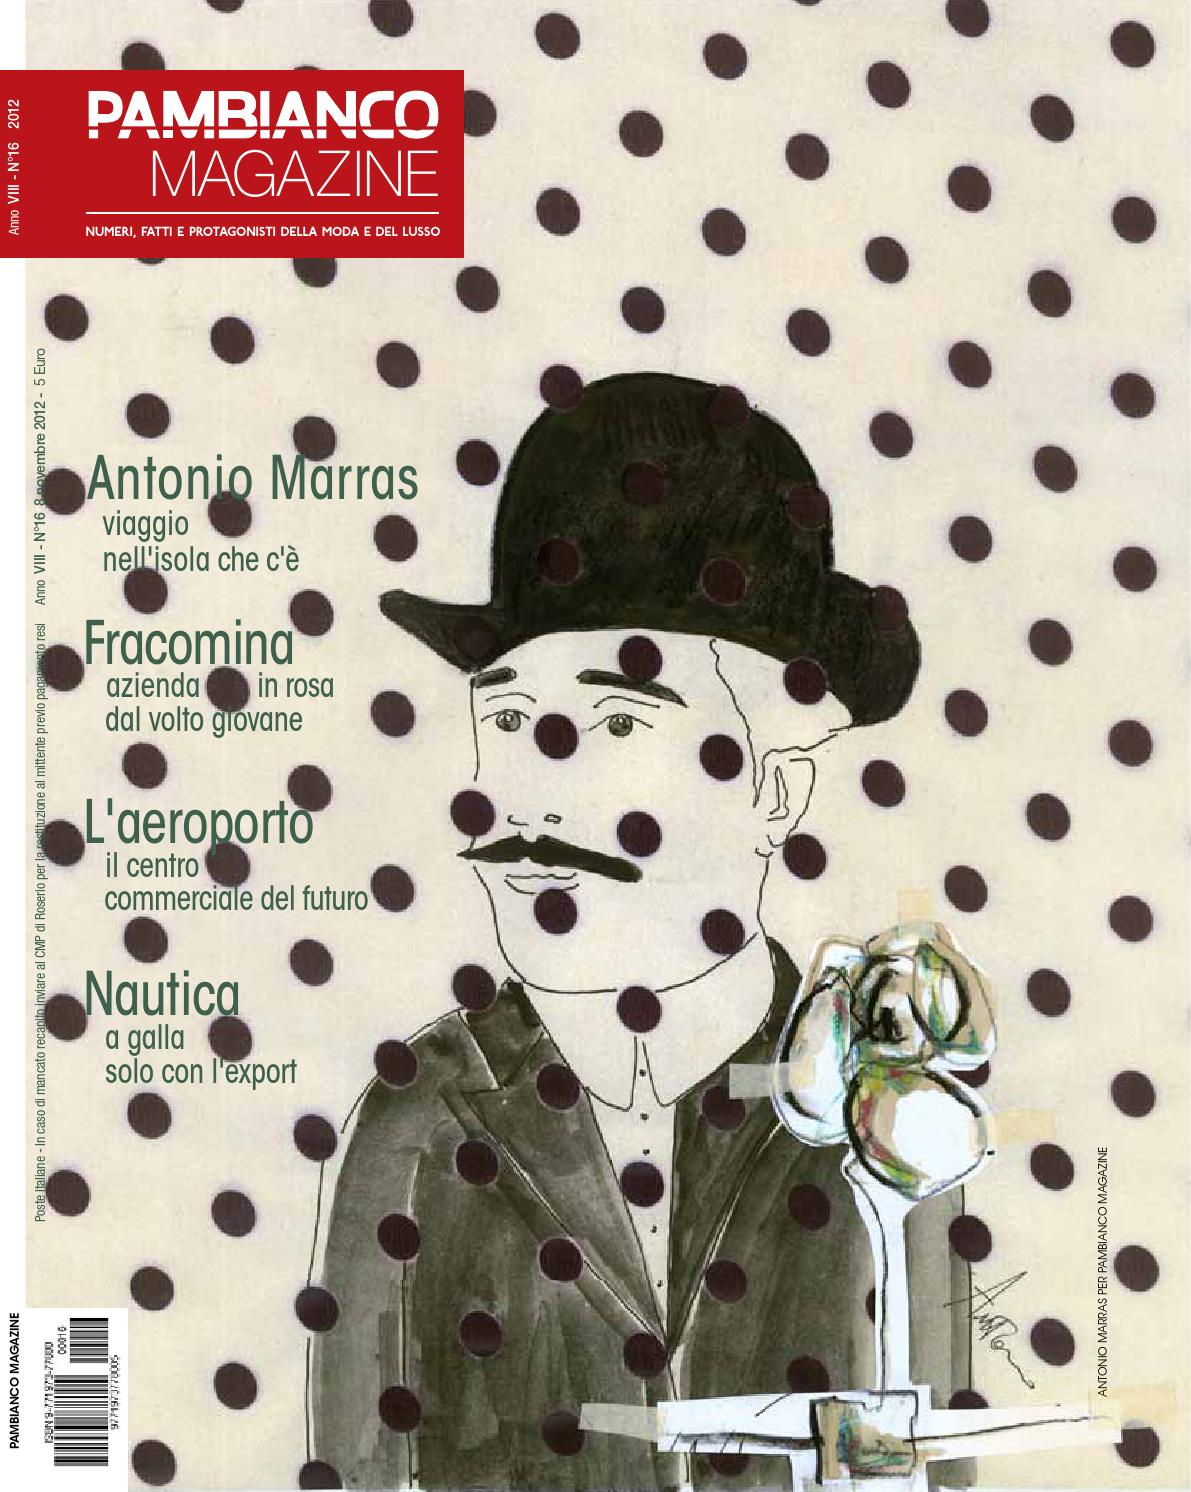 Pambianco magazine N.16 VIII by Pambianconews - issuu 99ea730bb045